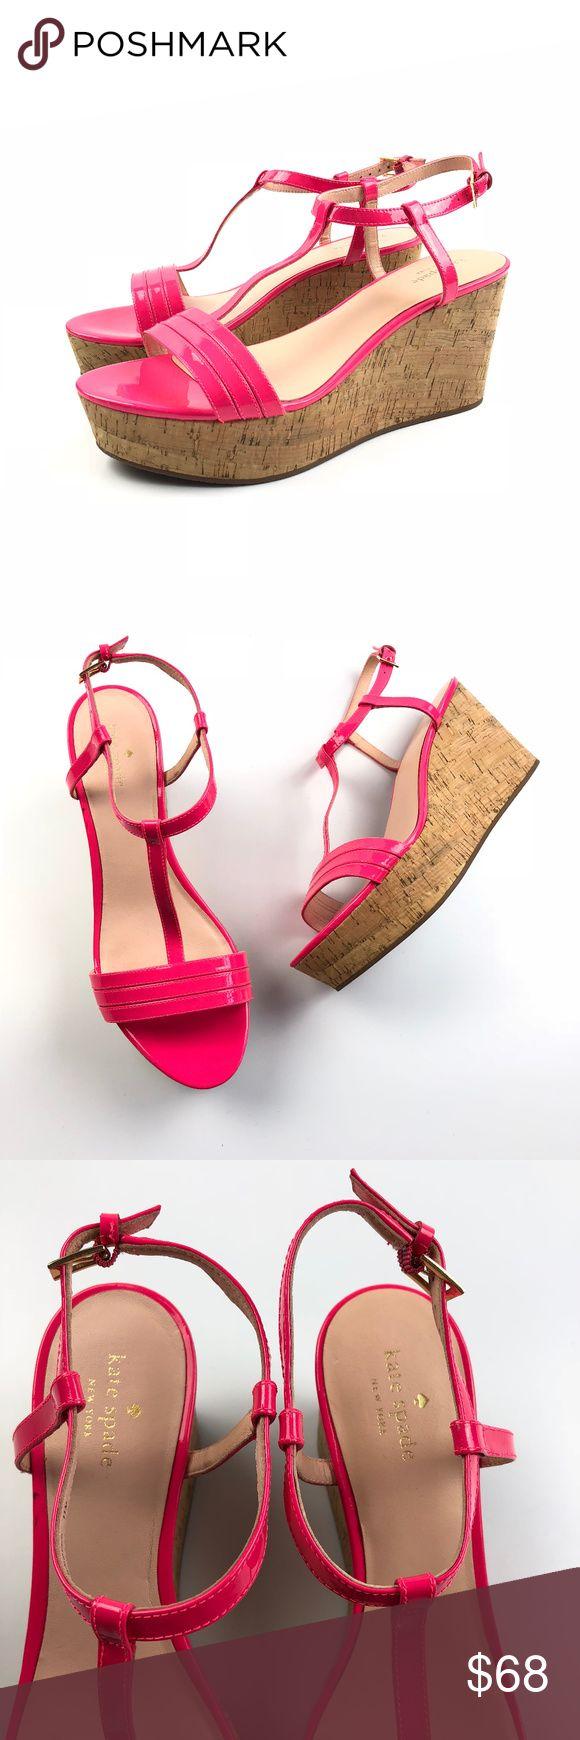 "Kate Spade Tallin Lipstick Hot Pink Wedge Sandals New without box. Kate Spade tallin cork platform wedge sandals in lipstick hot pink. Size 11 Apx: 3 1/2"" heel. 1 1/2"" platform. kate spade Shoes Platforms"